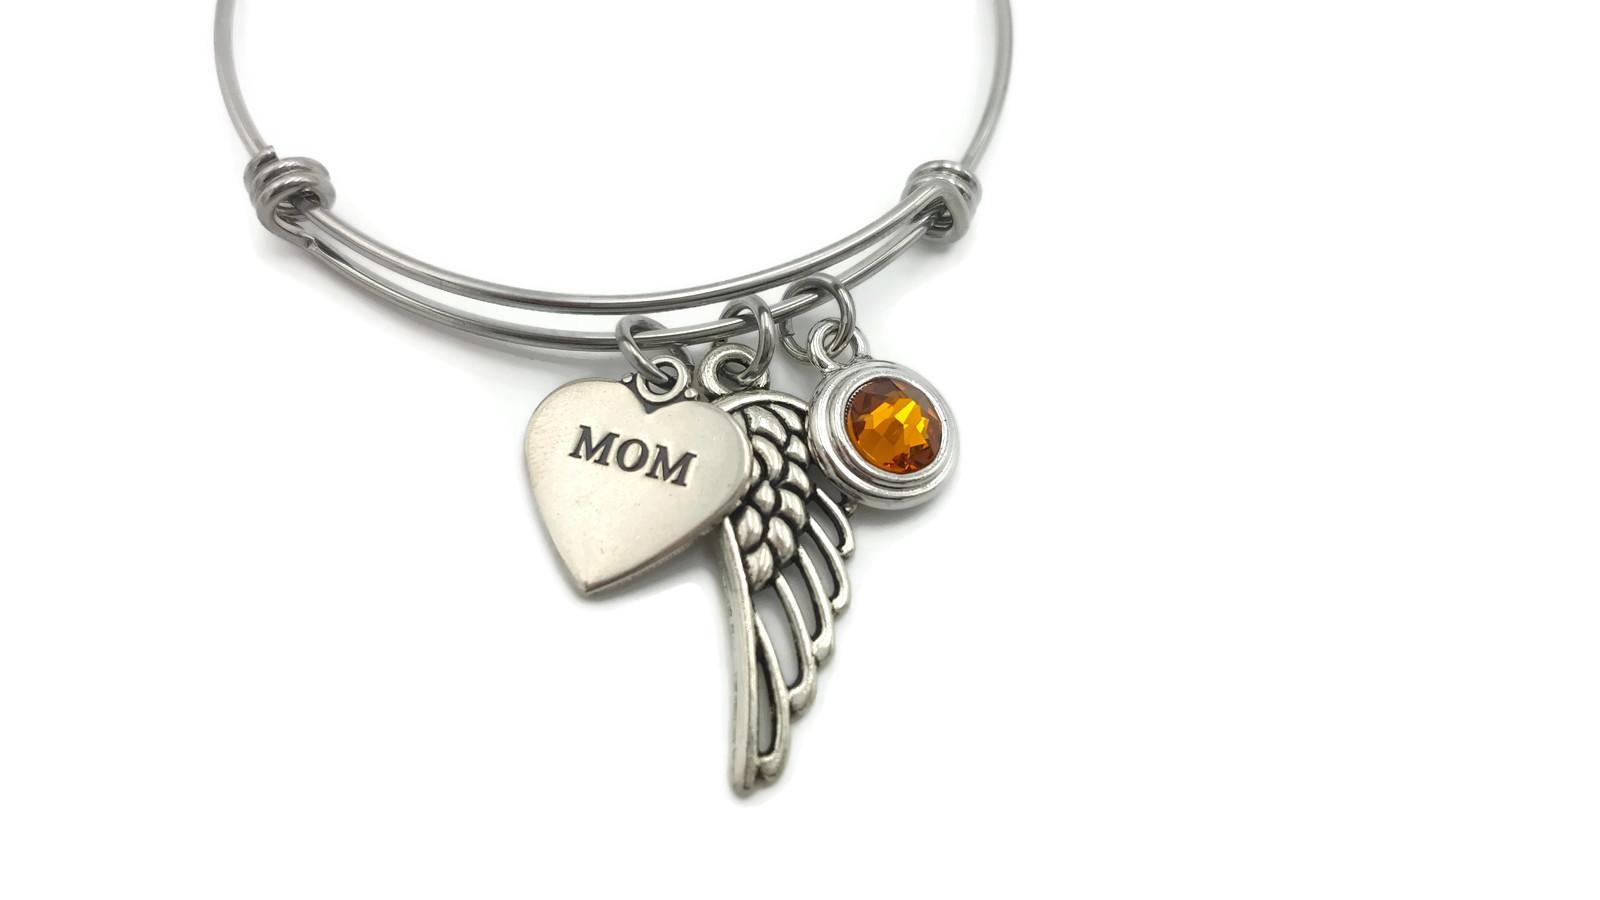 Memorial Bracelet for Loss of Mom - Remembrance Bracelet